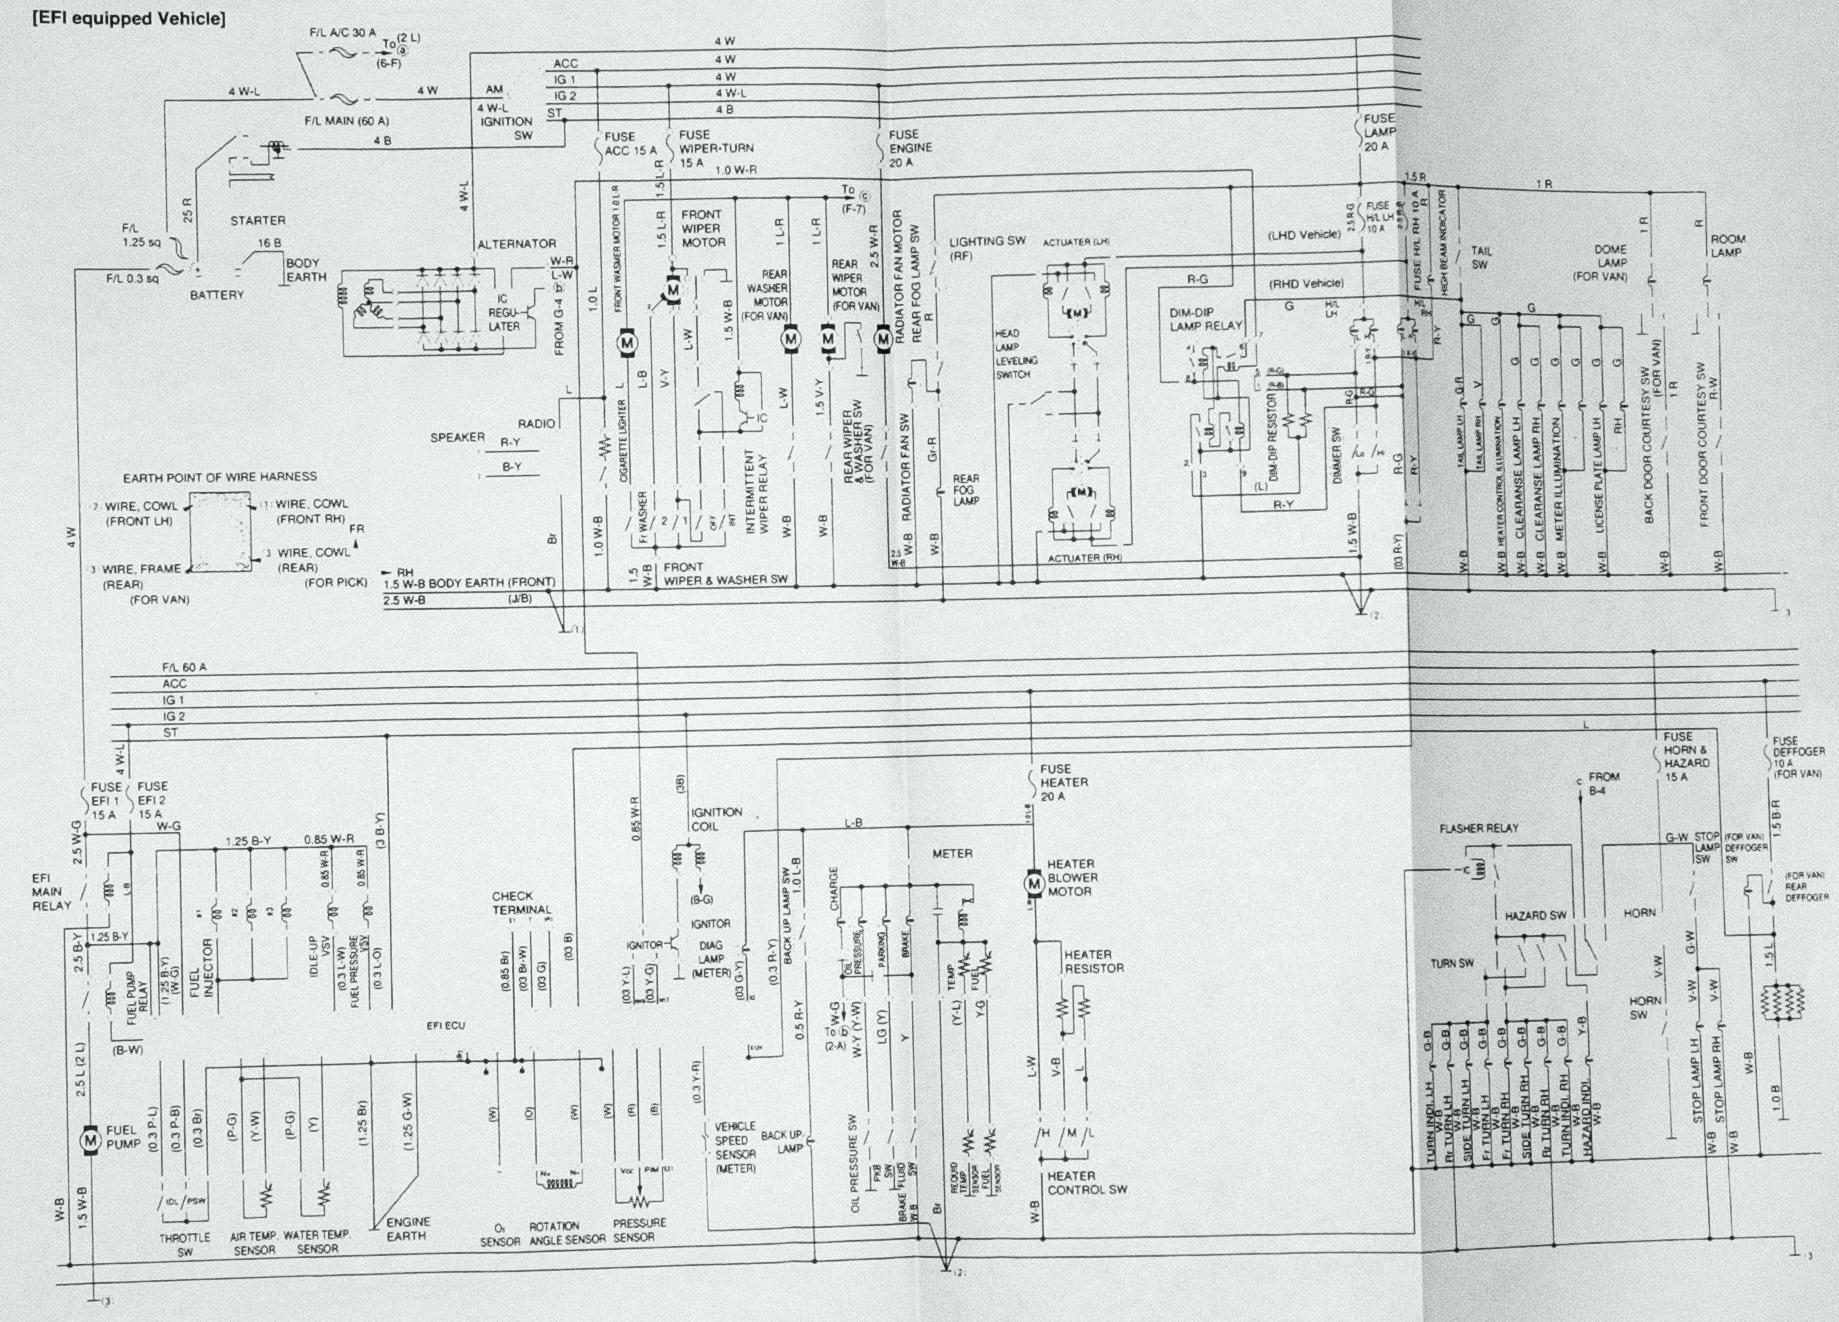 Daihatsu Rocky Diesel Specs Gaudet Hd Images Gaudet Imagine Daihatsu 4x4  Mini Truck Daihatsu Hijet Engine. Daihatsu Hijet Engine Diagram ...